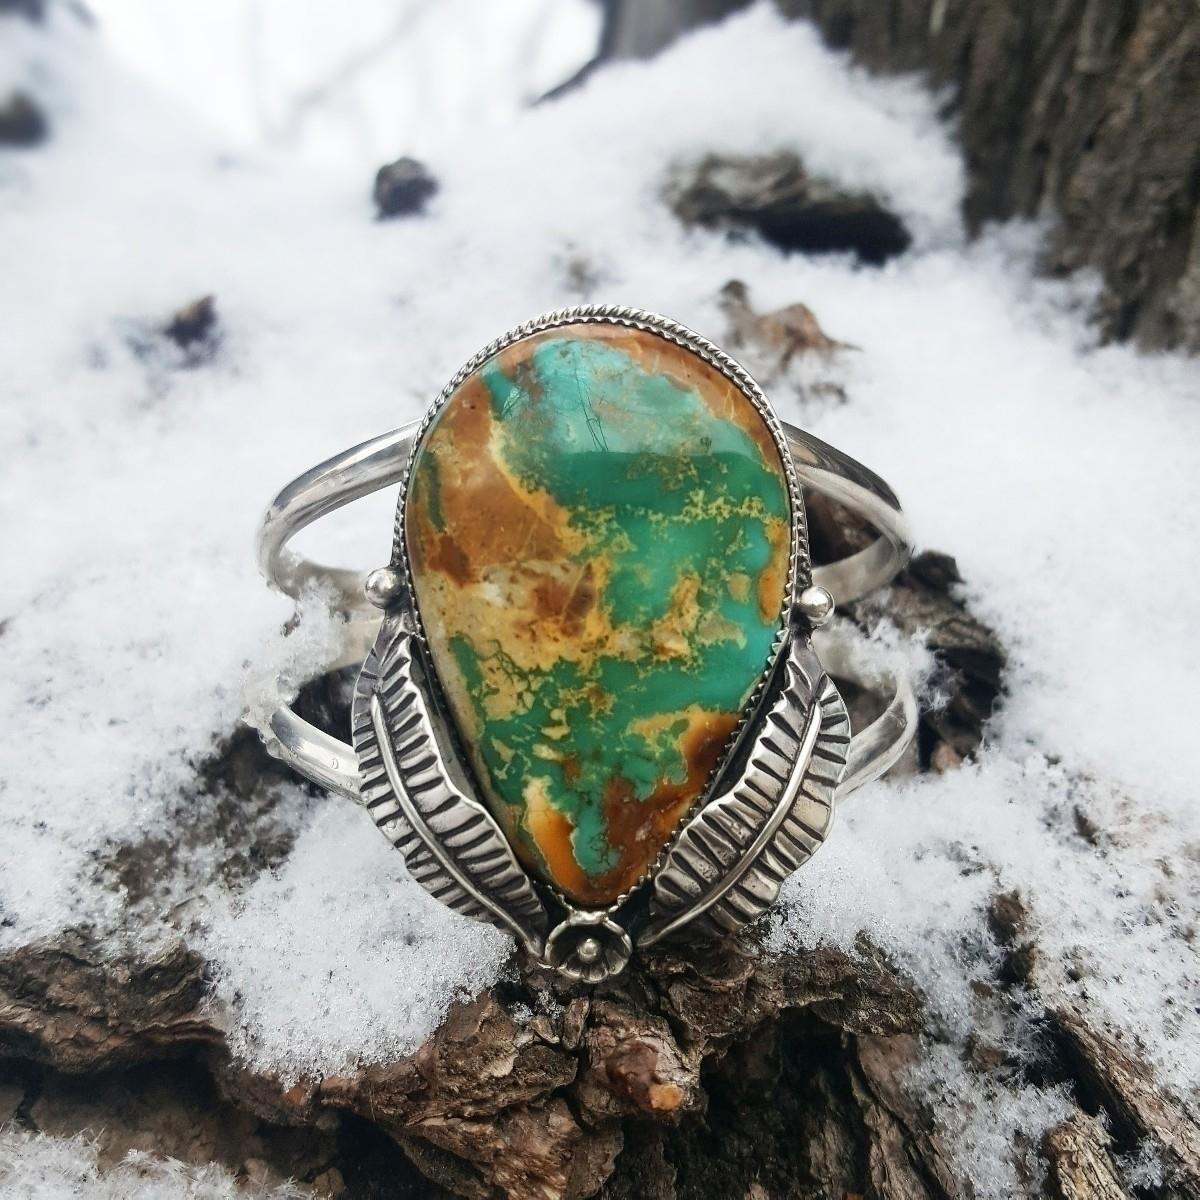 throwback beauty - ellojewelry, ellomakers - innersistersilver | ello